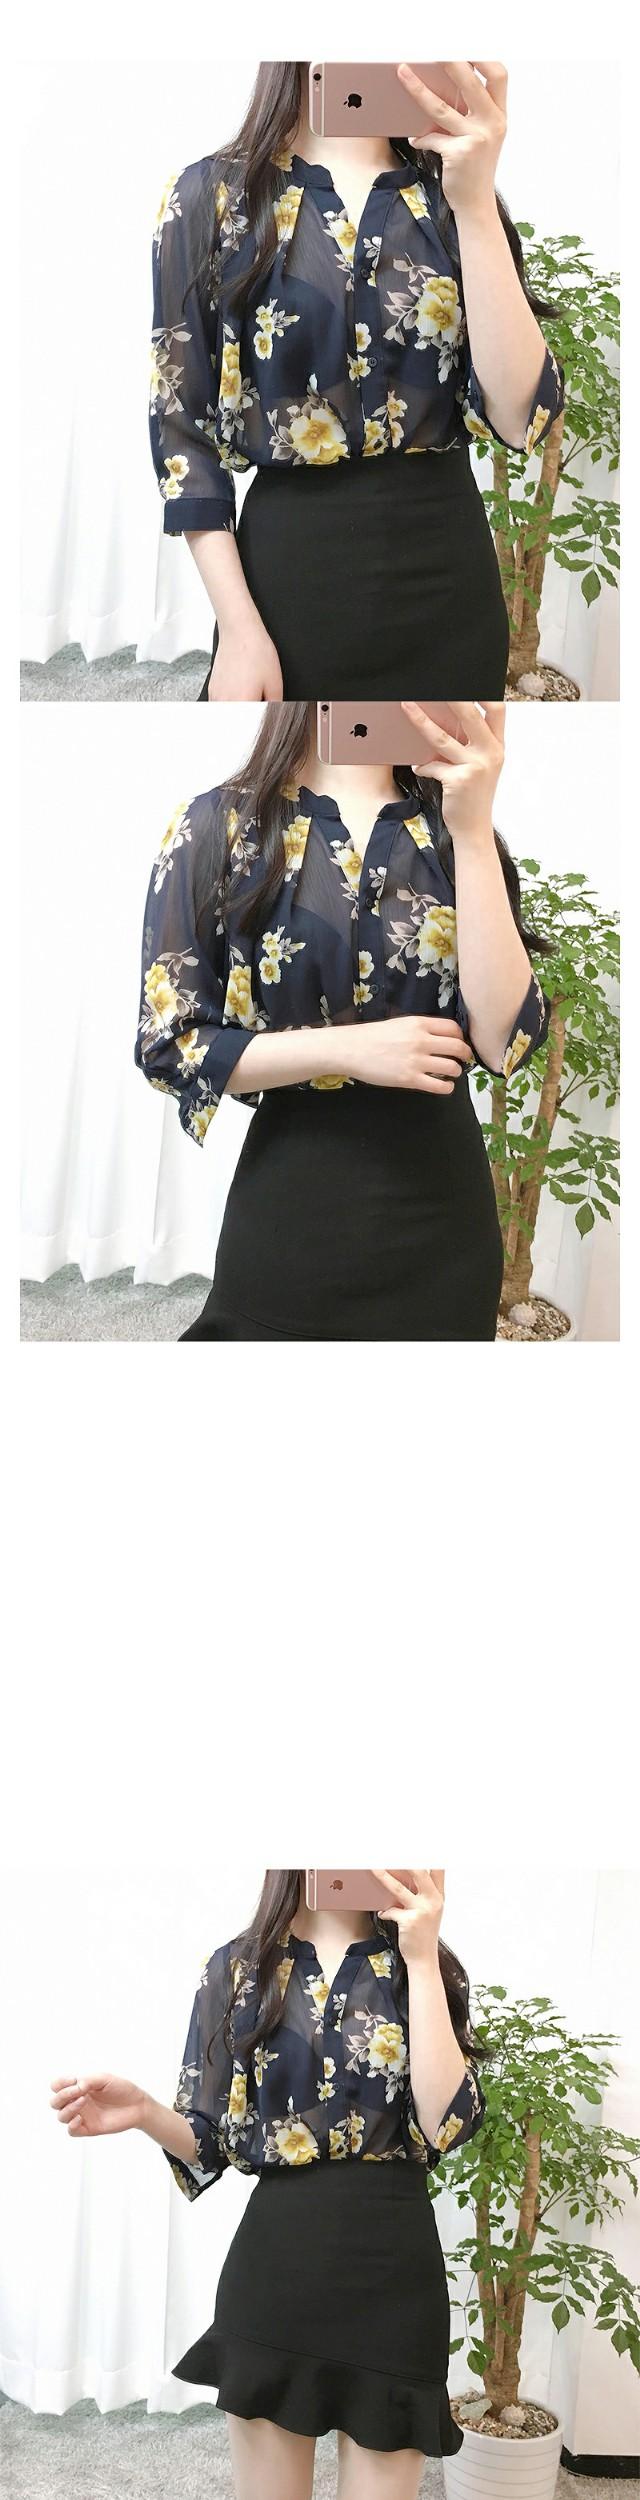 Sweet flower blouse